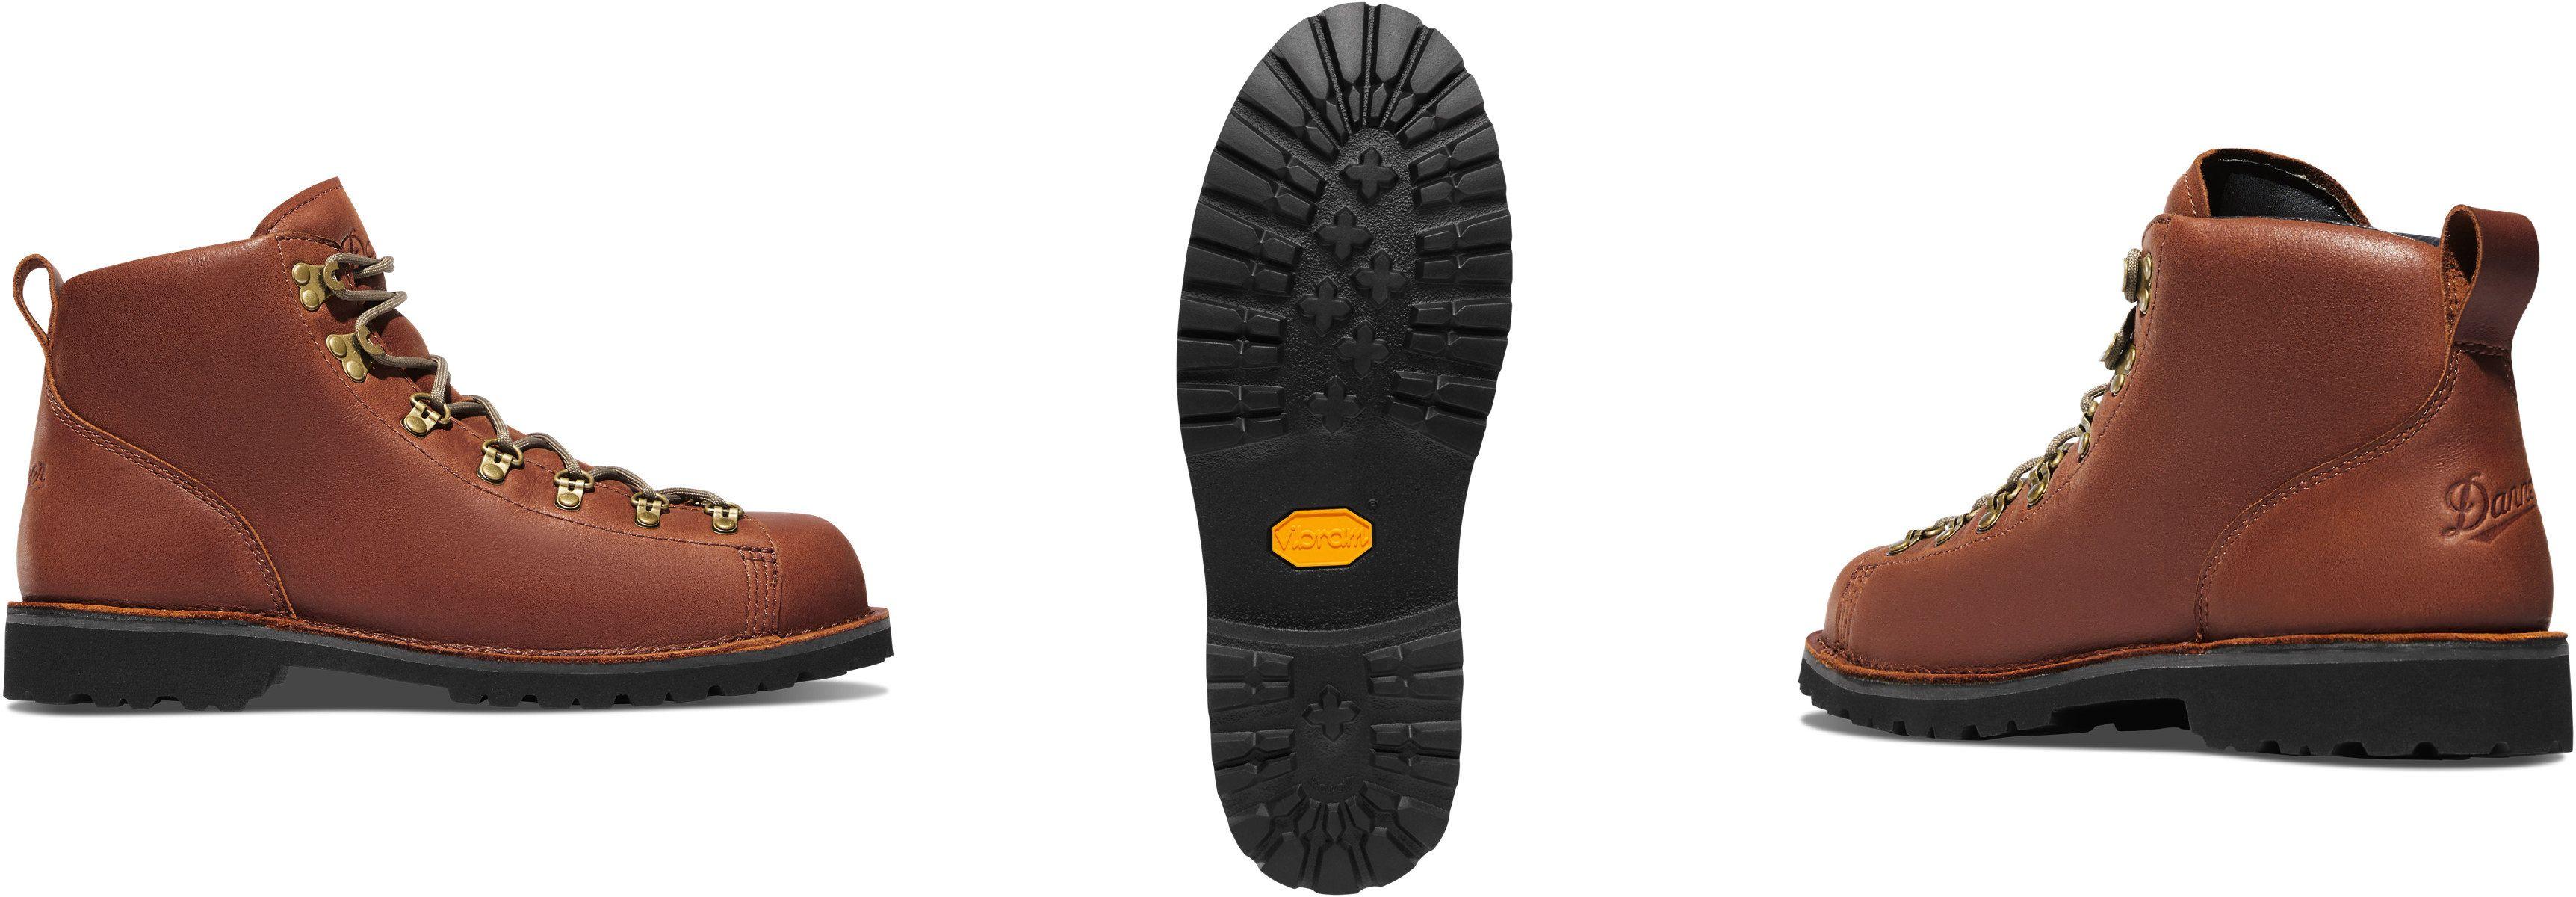 d5e61d27e383 ... size 40 82c06 ca9dc The Danner North Fork Rambler Boot – A Classic  Outdoor Work Boot